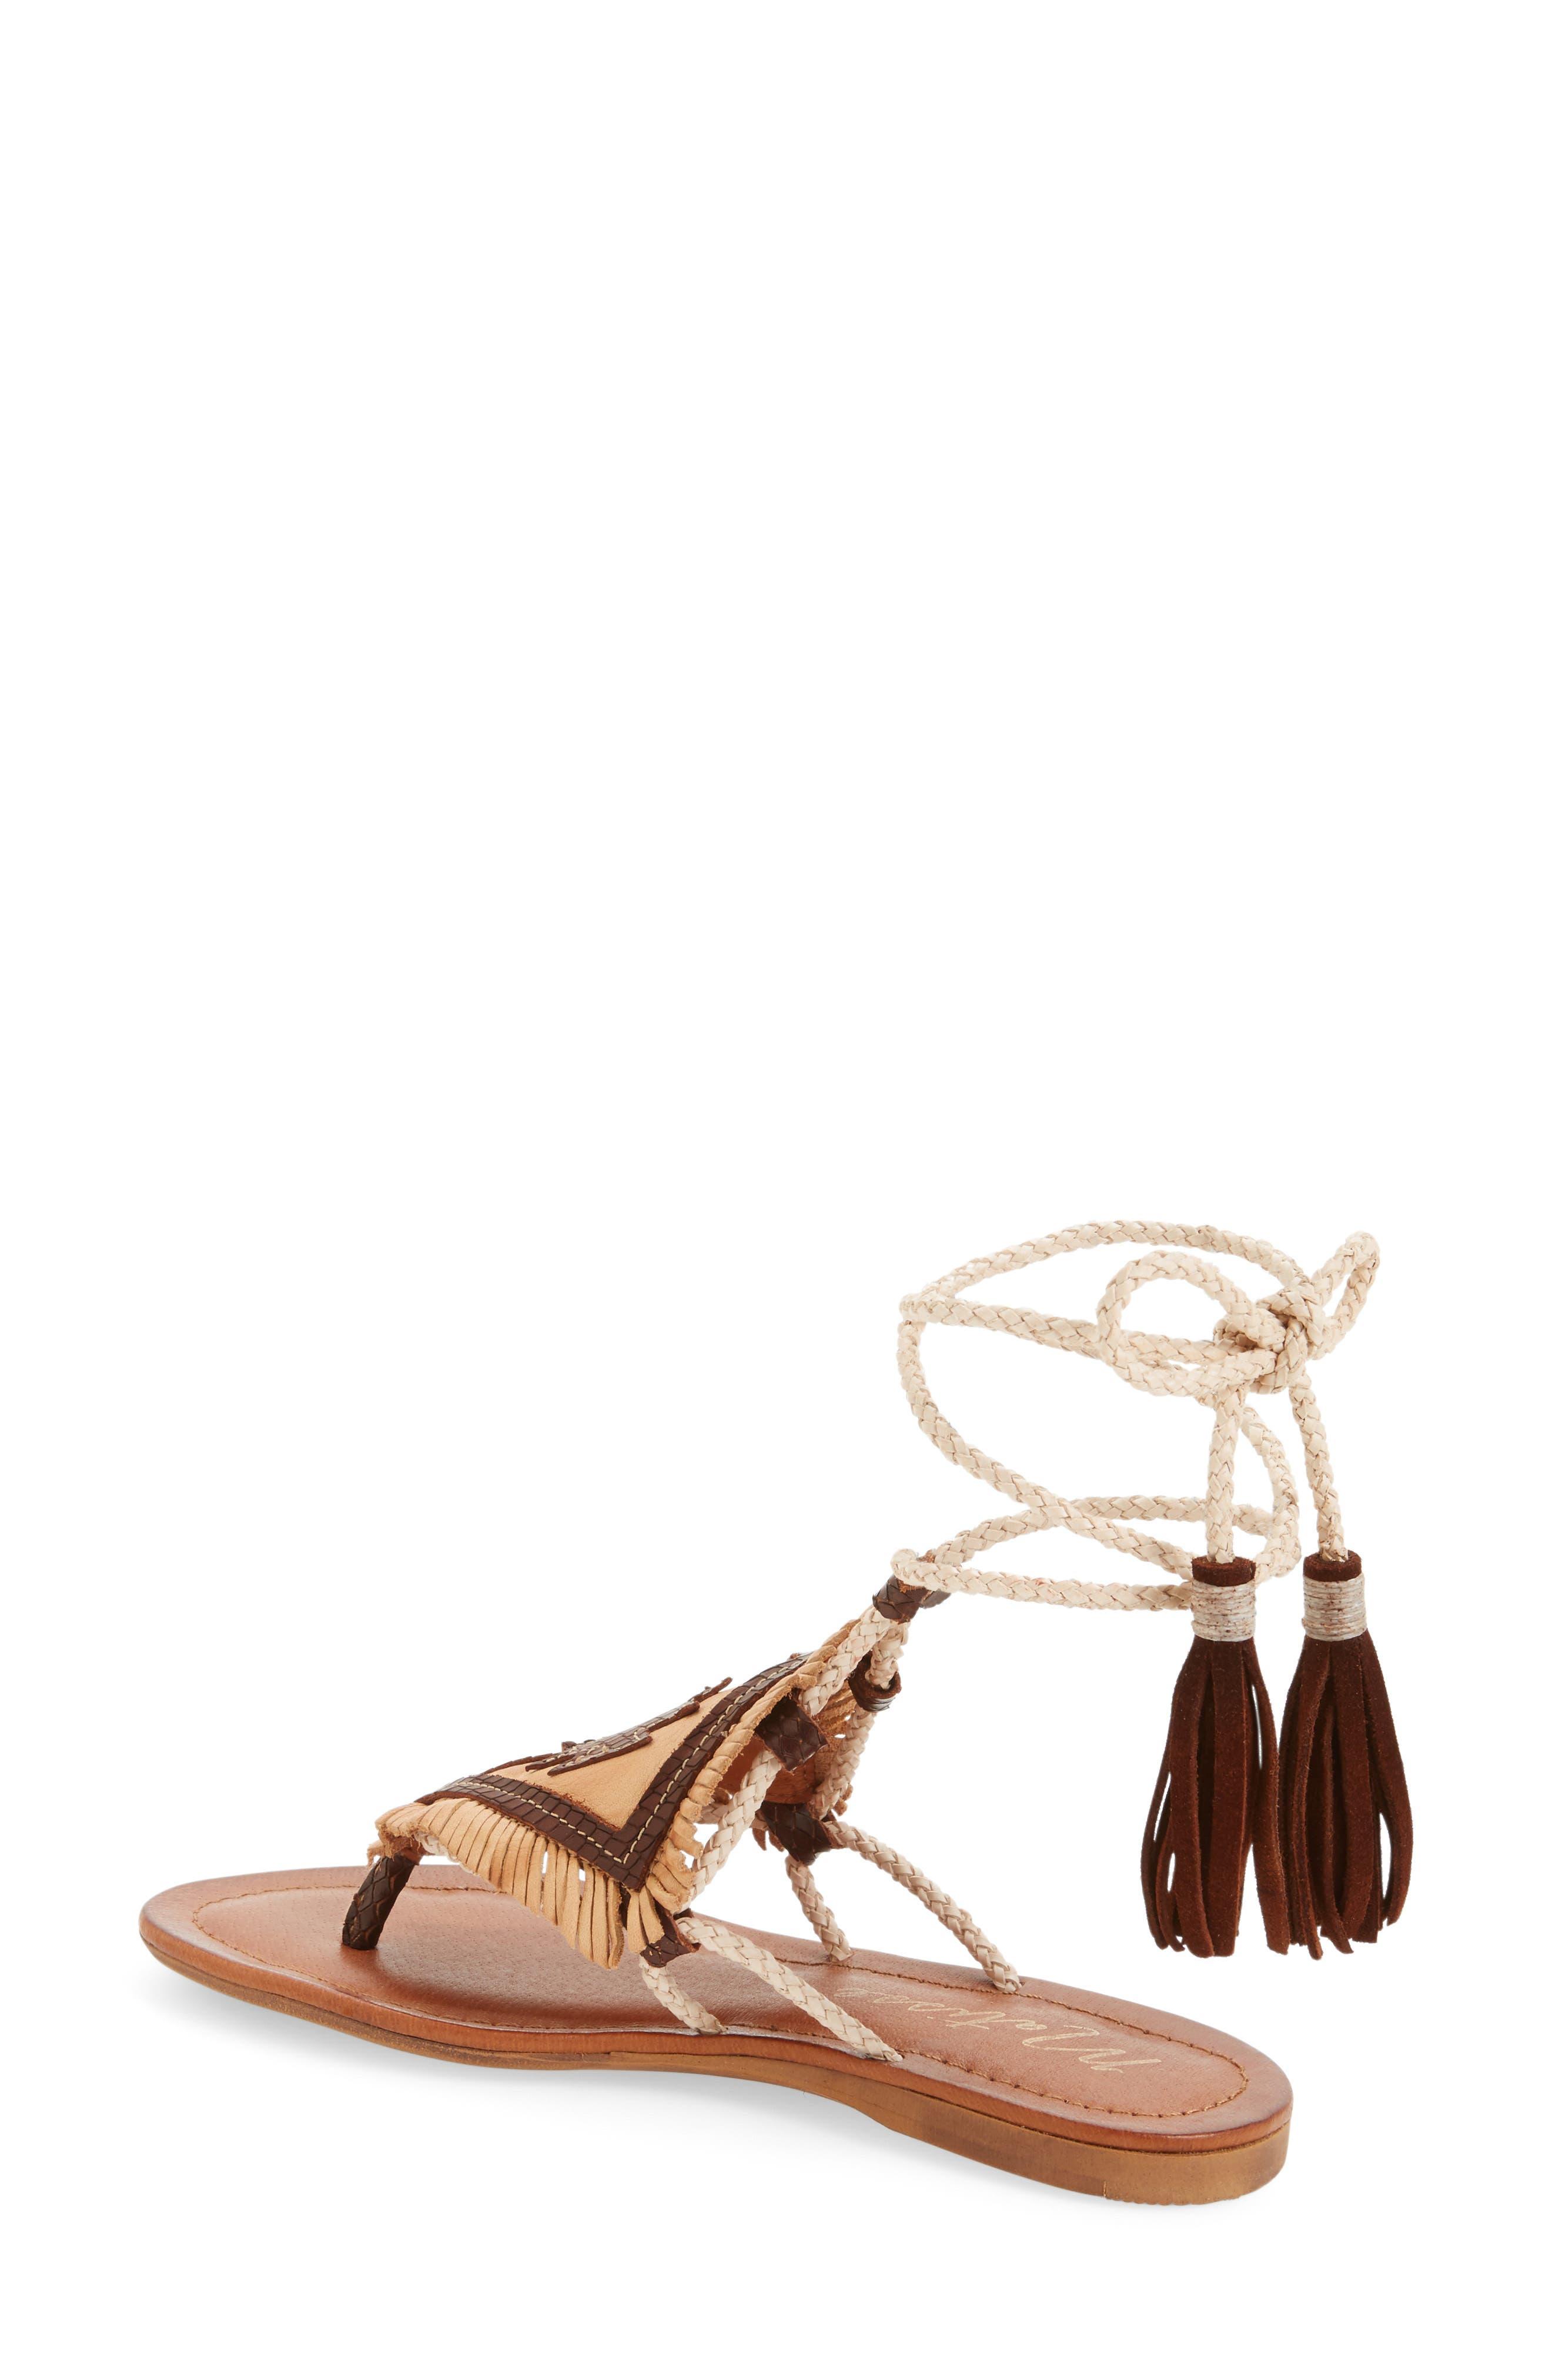 Bronte Tassel Lace-Up Sandal,                             Alternate thumbnail 2, color,                             250